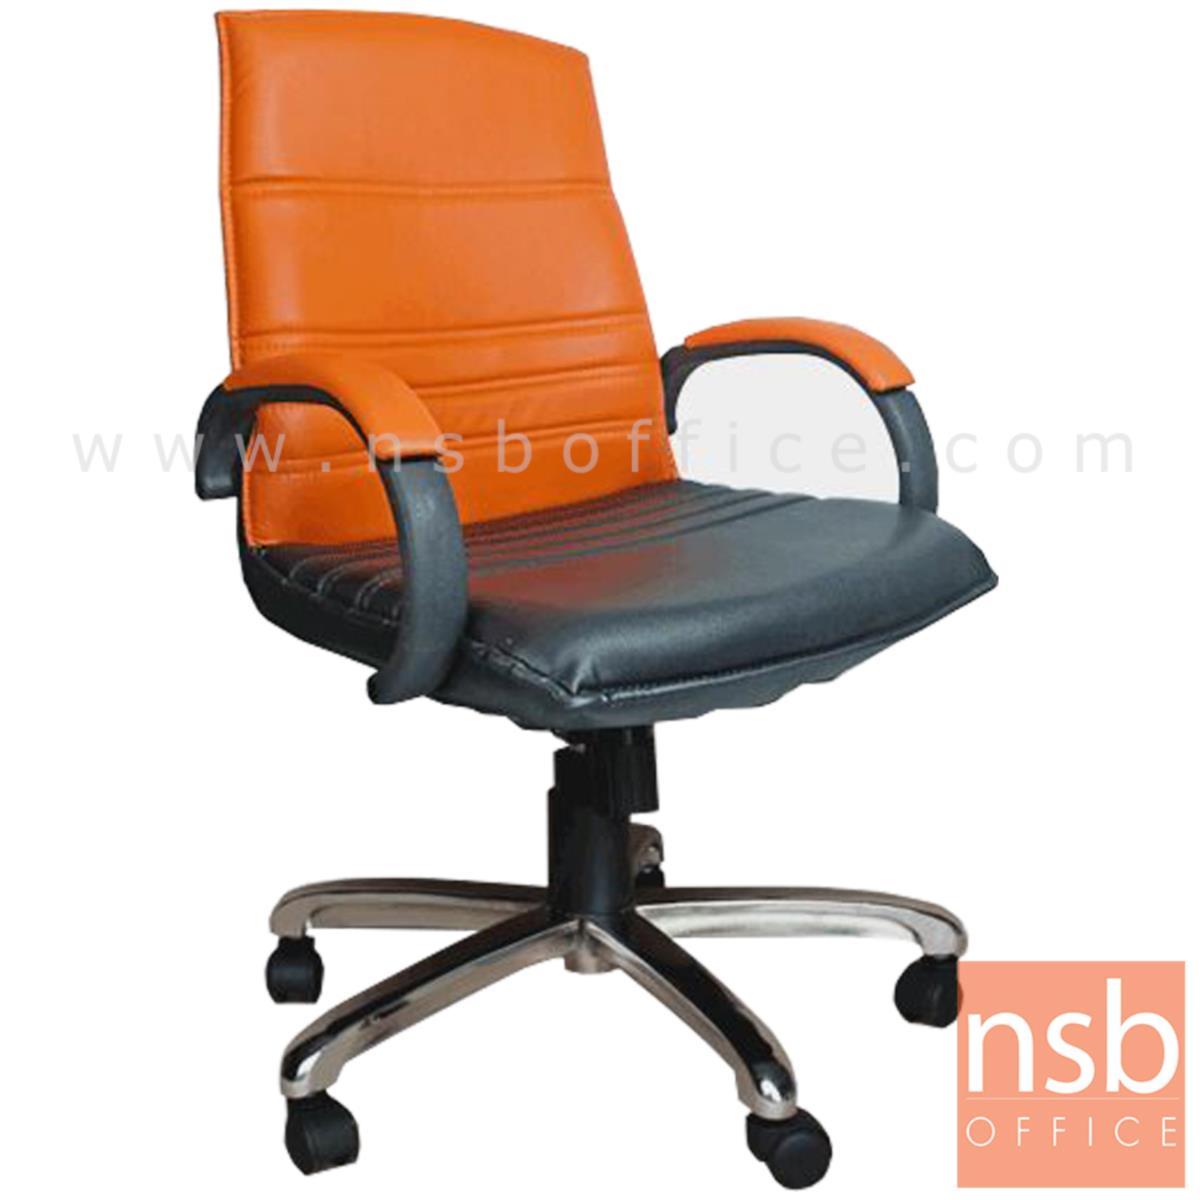 B26A032:เก้าอี้สำนักงาน รุ่น Arline (อาร์ไลน์)  โช๊คแก๊ส มีก้อนโยก ขาเหล็กชุบโครเมี่ยม